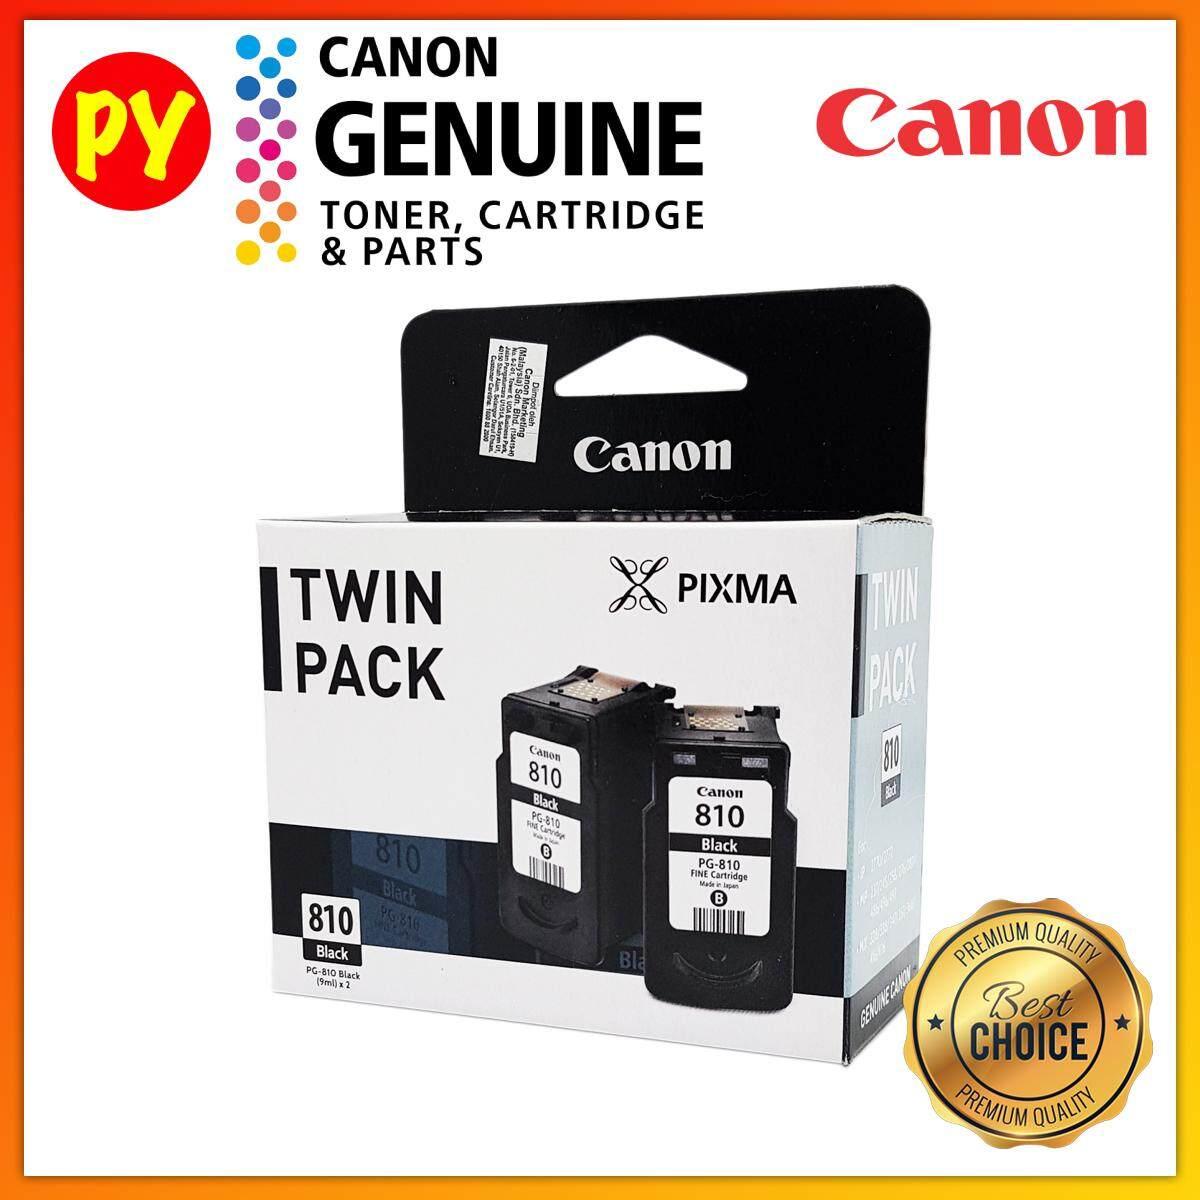 Canon Ink Price In Malaysia Best Lazada Catridge Buat Test Cl 811 Pg 810 Twin Pack Original Cartridge